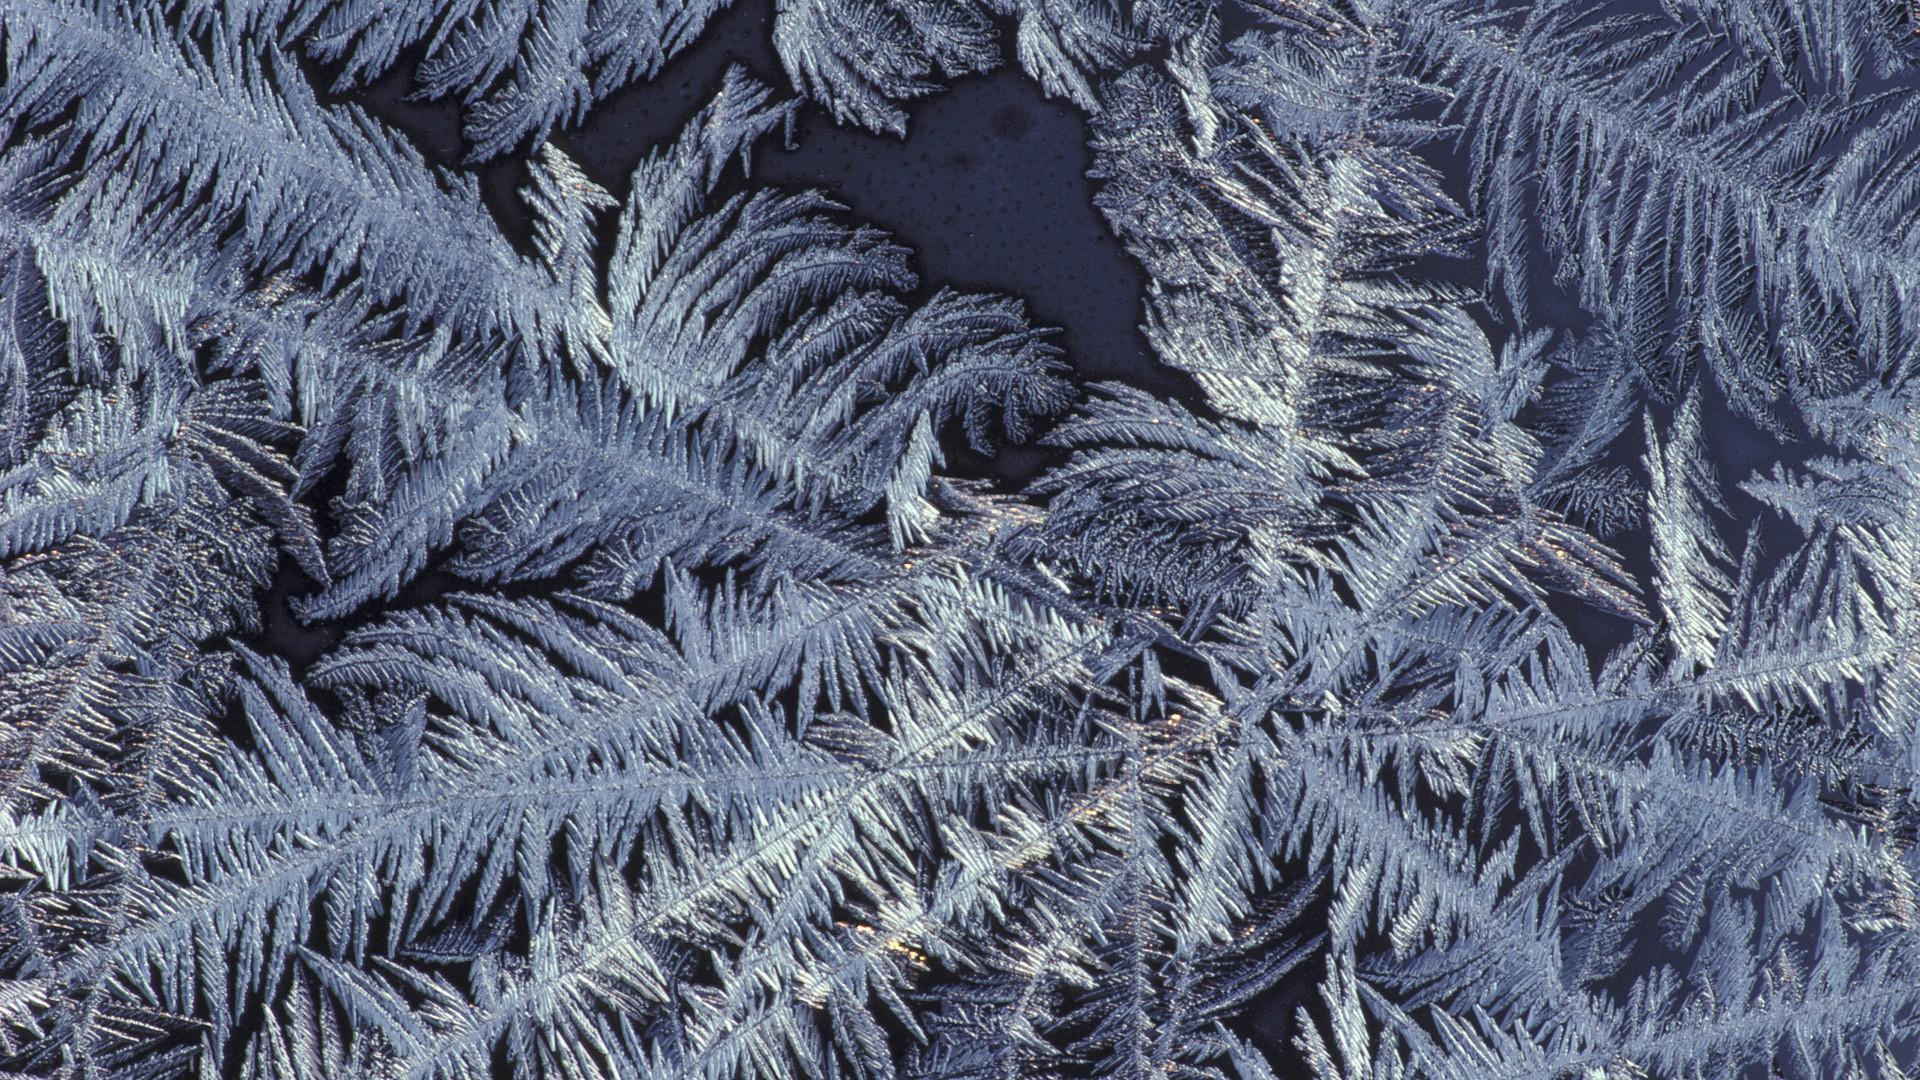 Patterns Frost Wallpaper 1920x1080 Patterns Frost 1920x1080